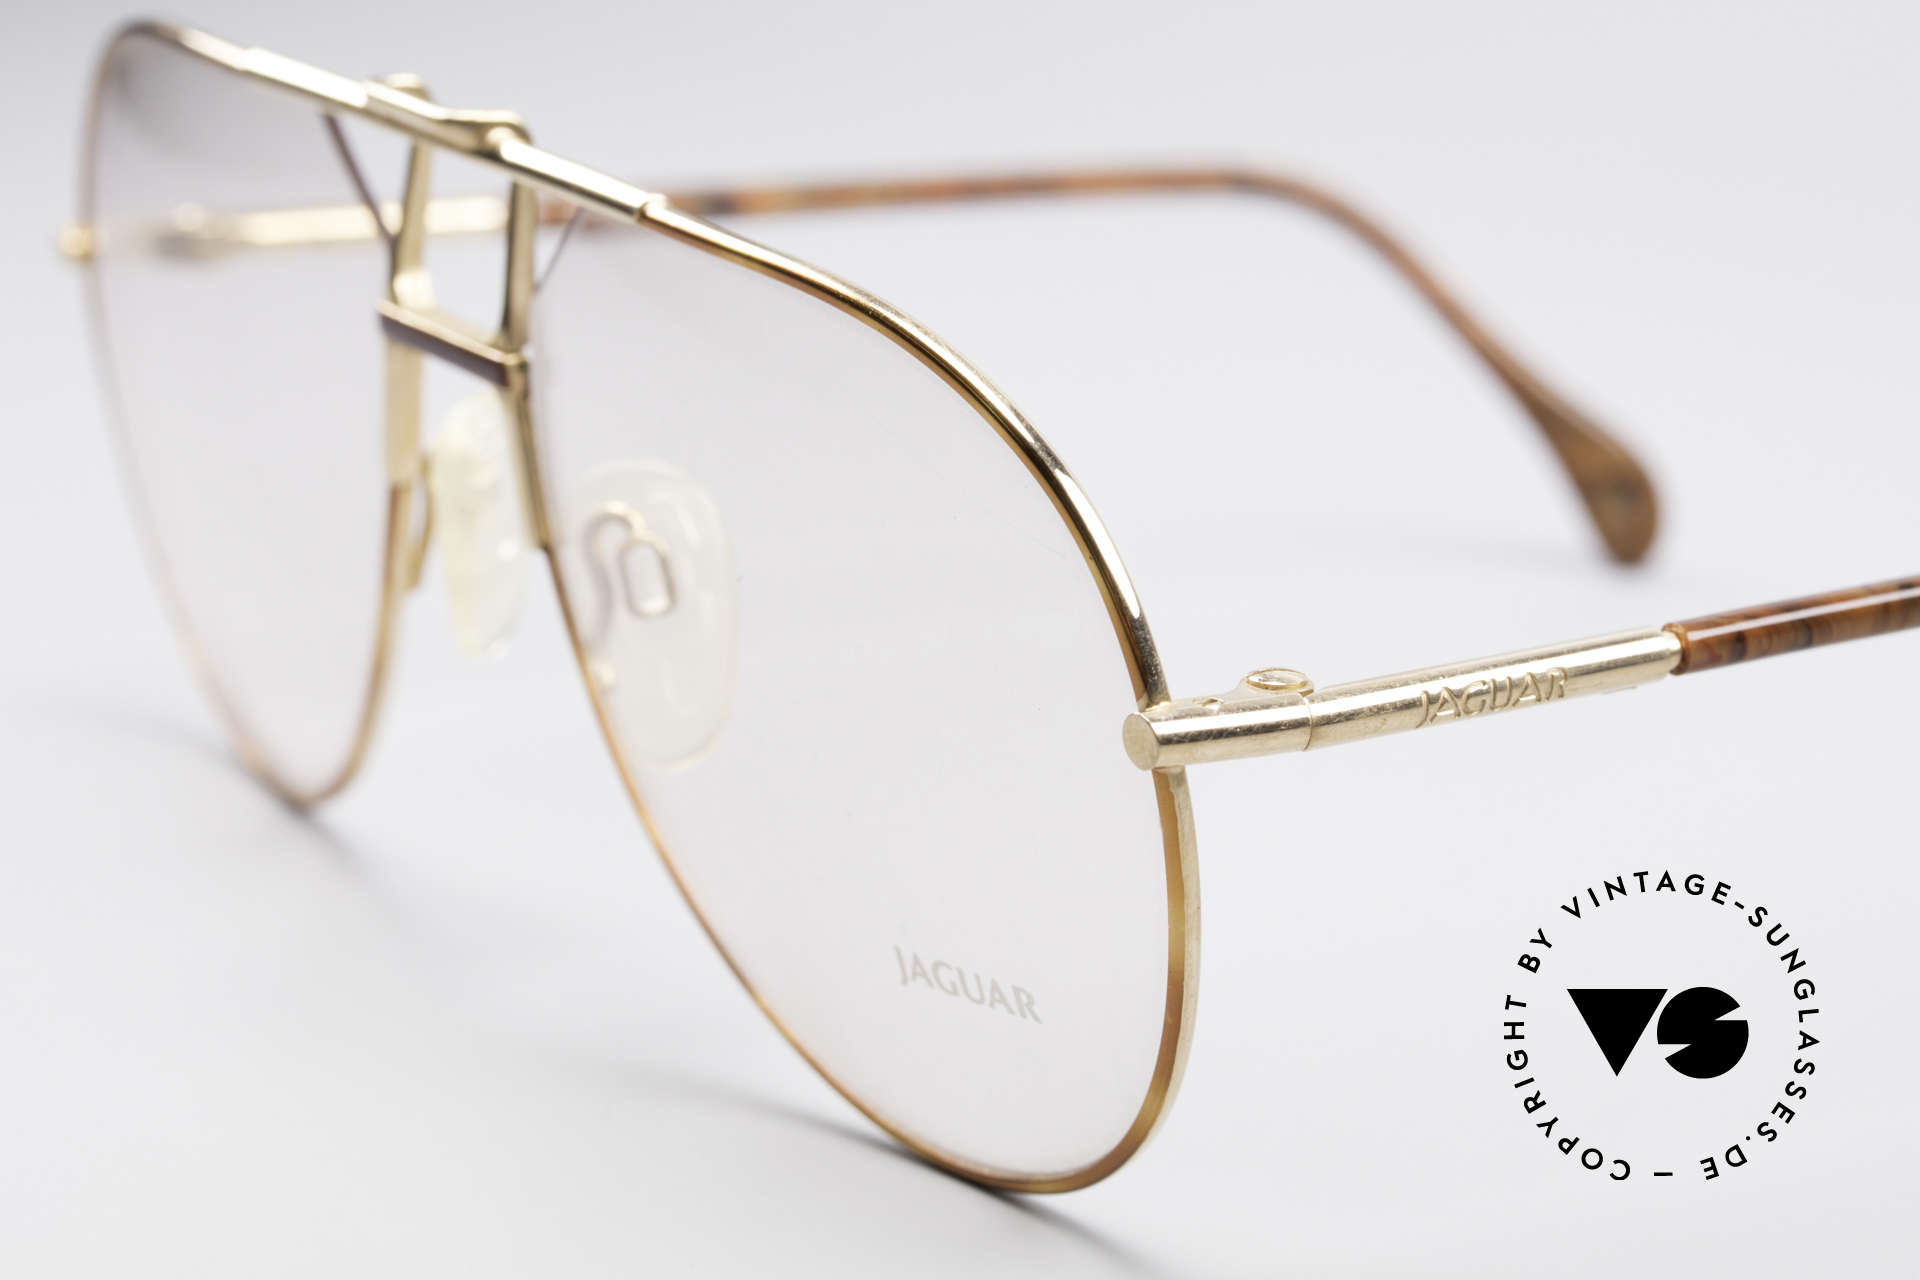 Jaguar 407 80's Luxury Eyeglasses, unworn (like all our vintage men's eyeglasses), Made for Men